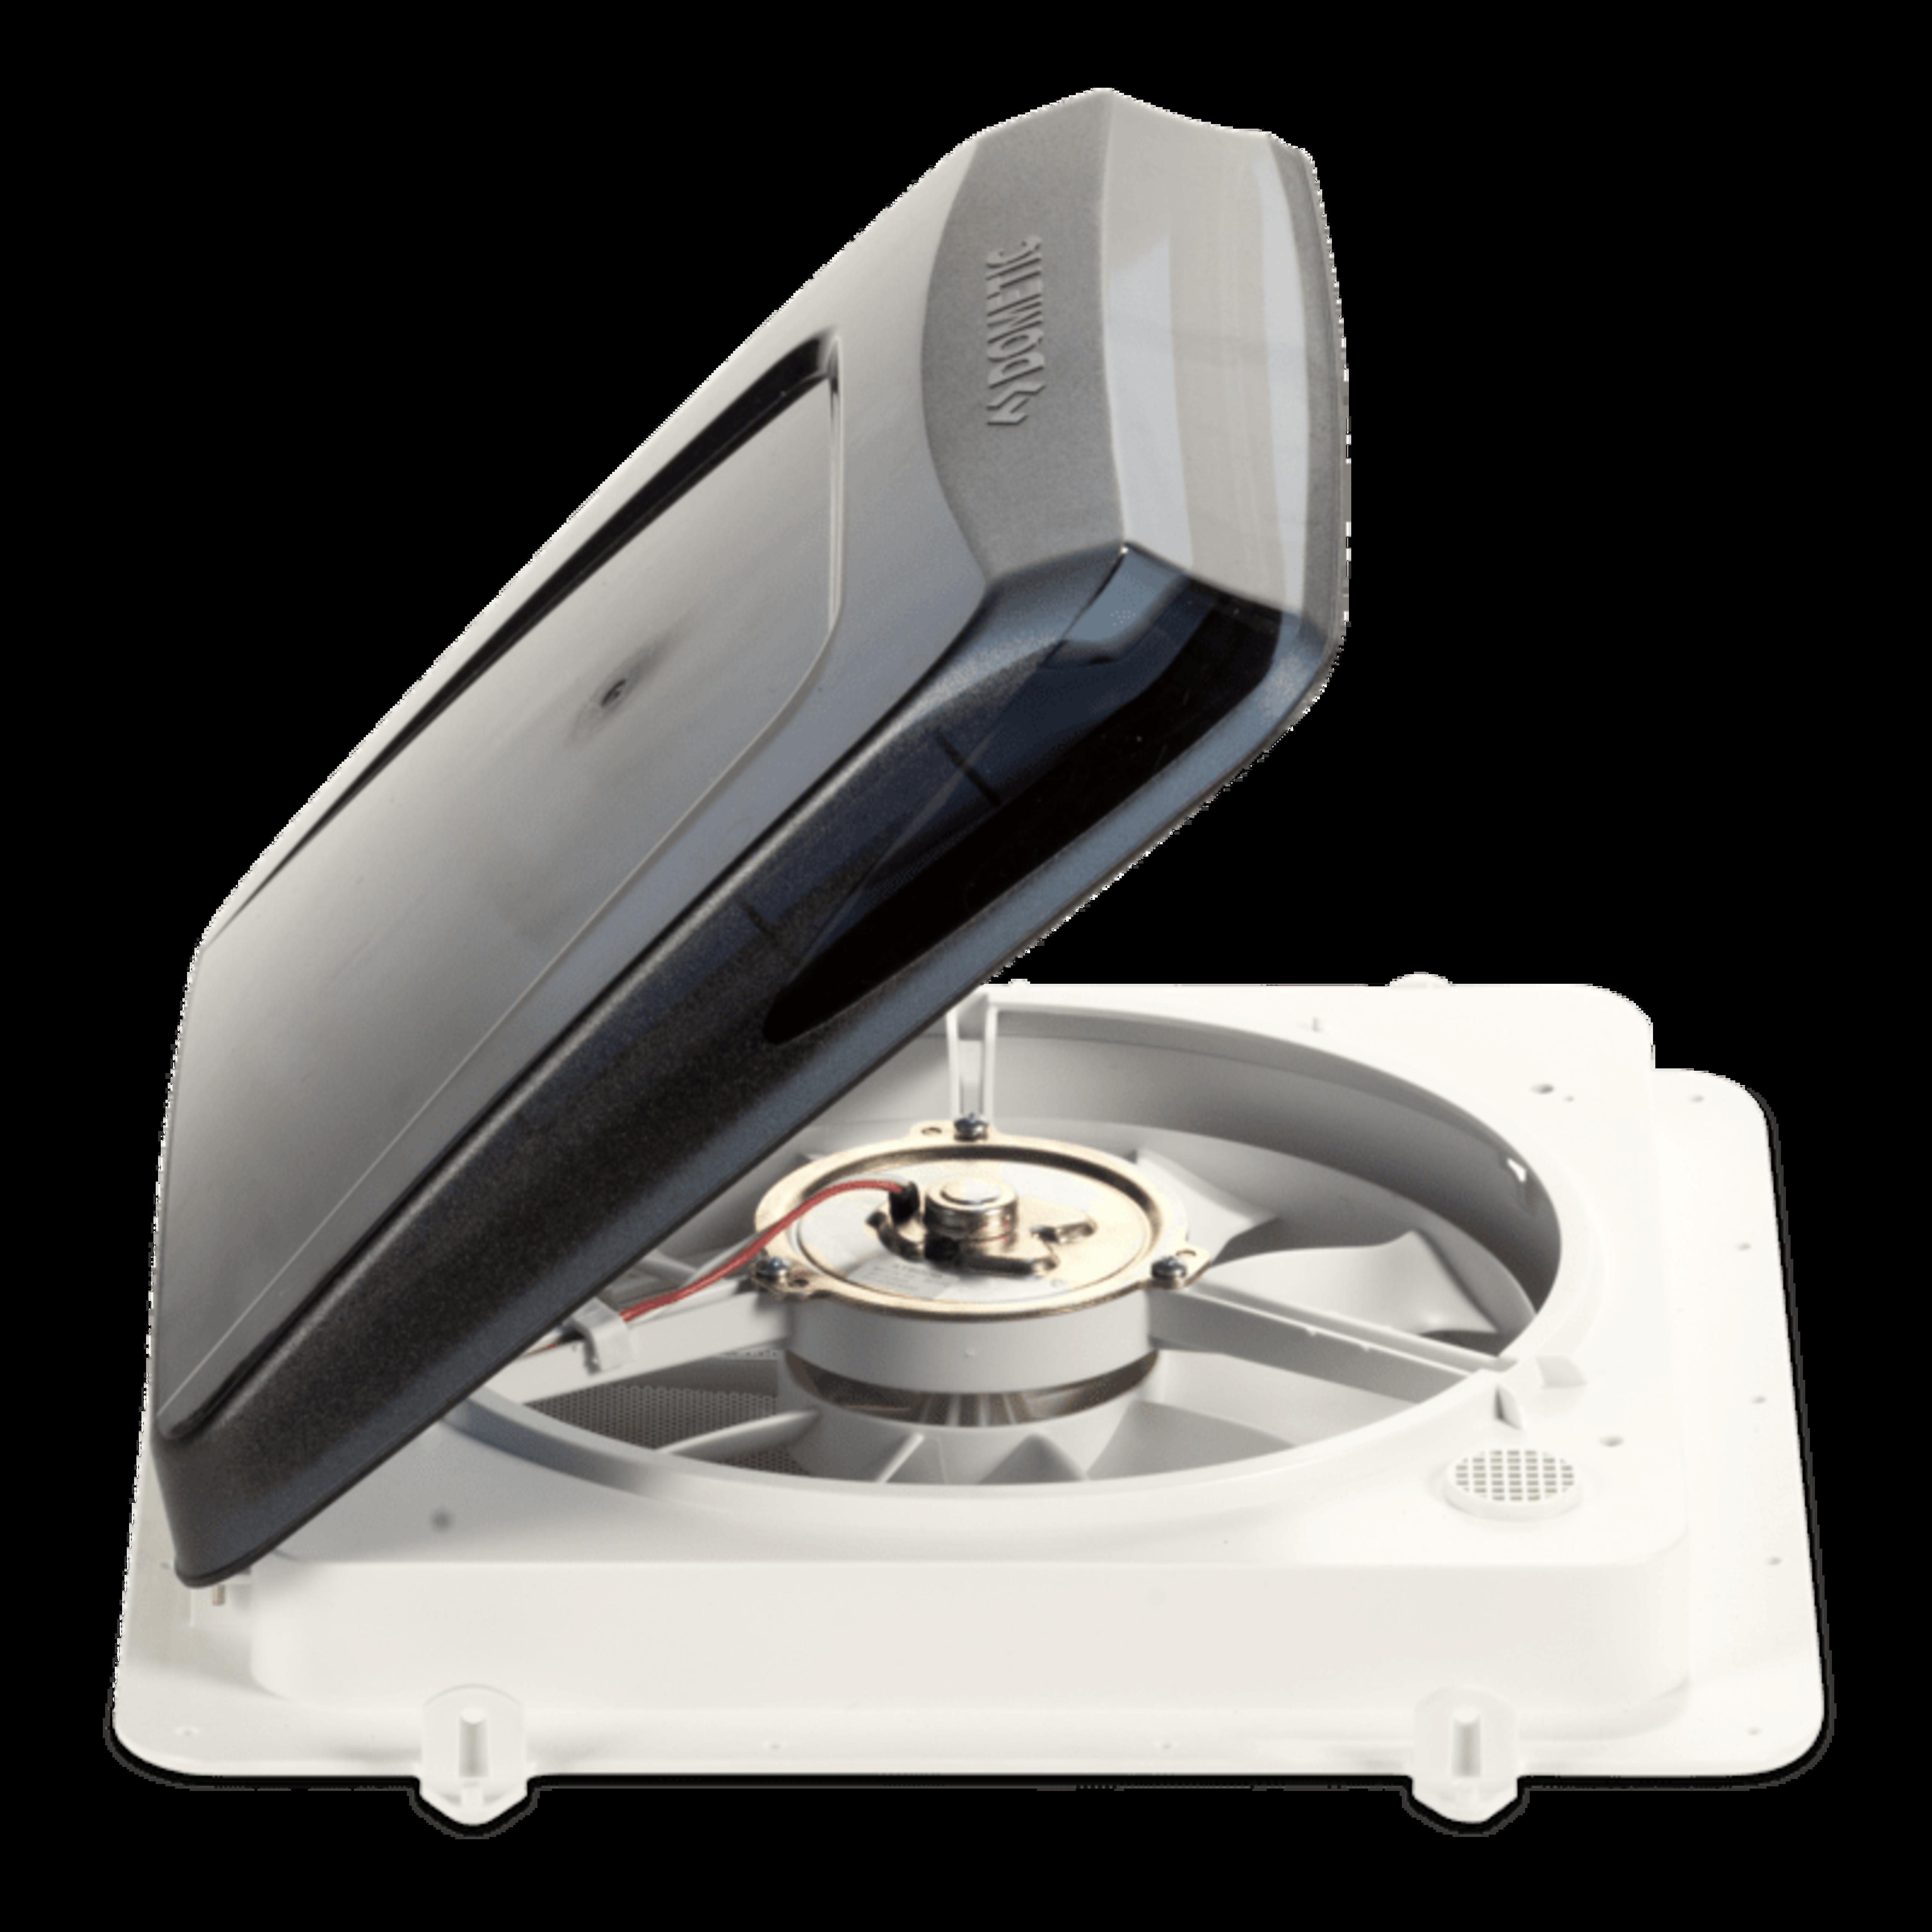 Dometic Fan-Tastic Vent 1400